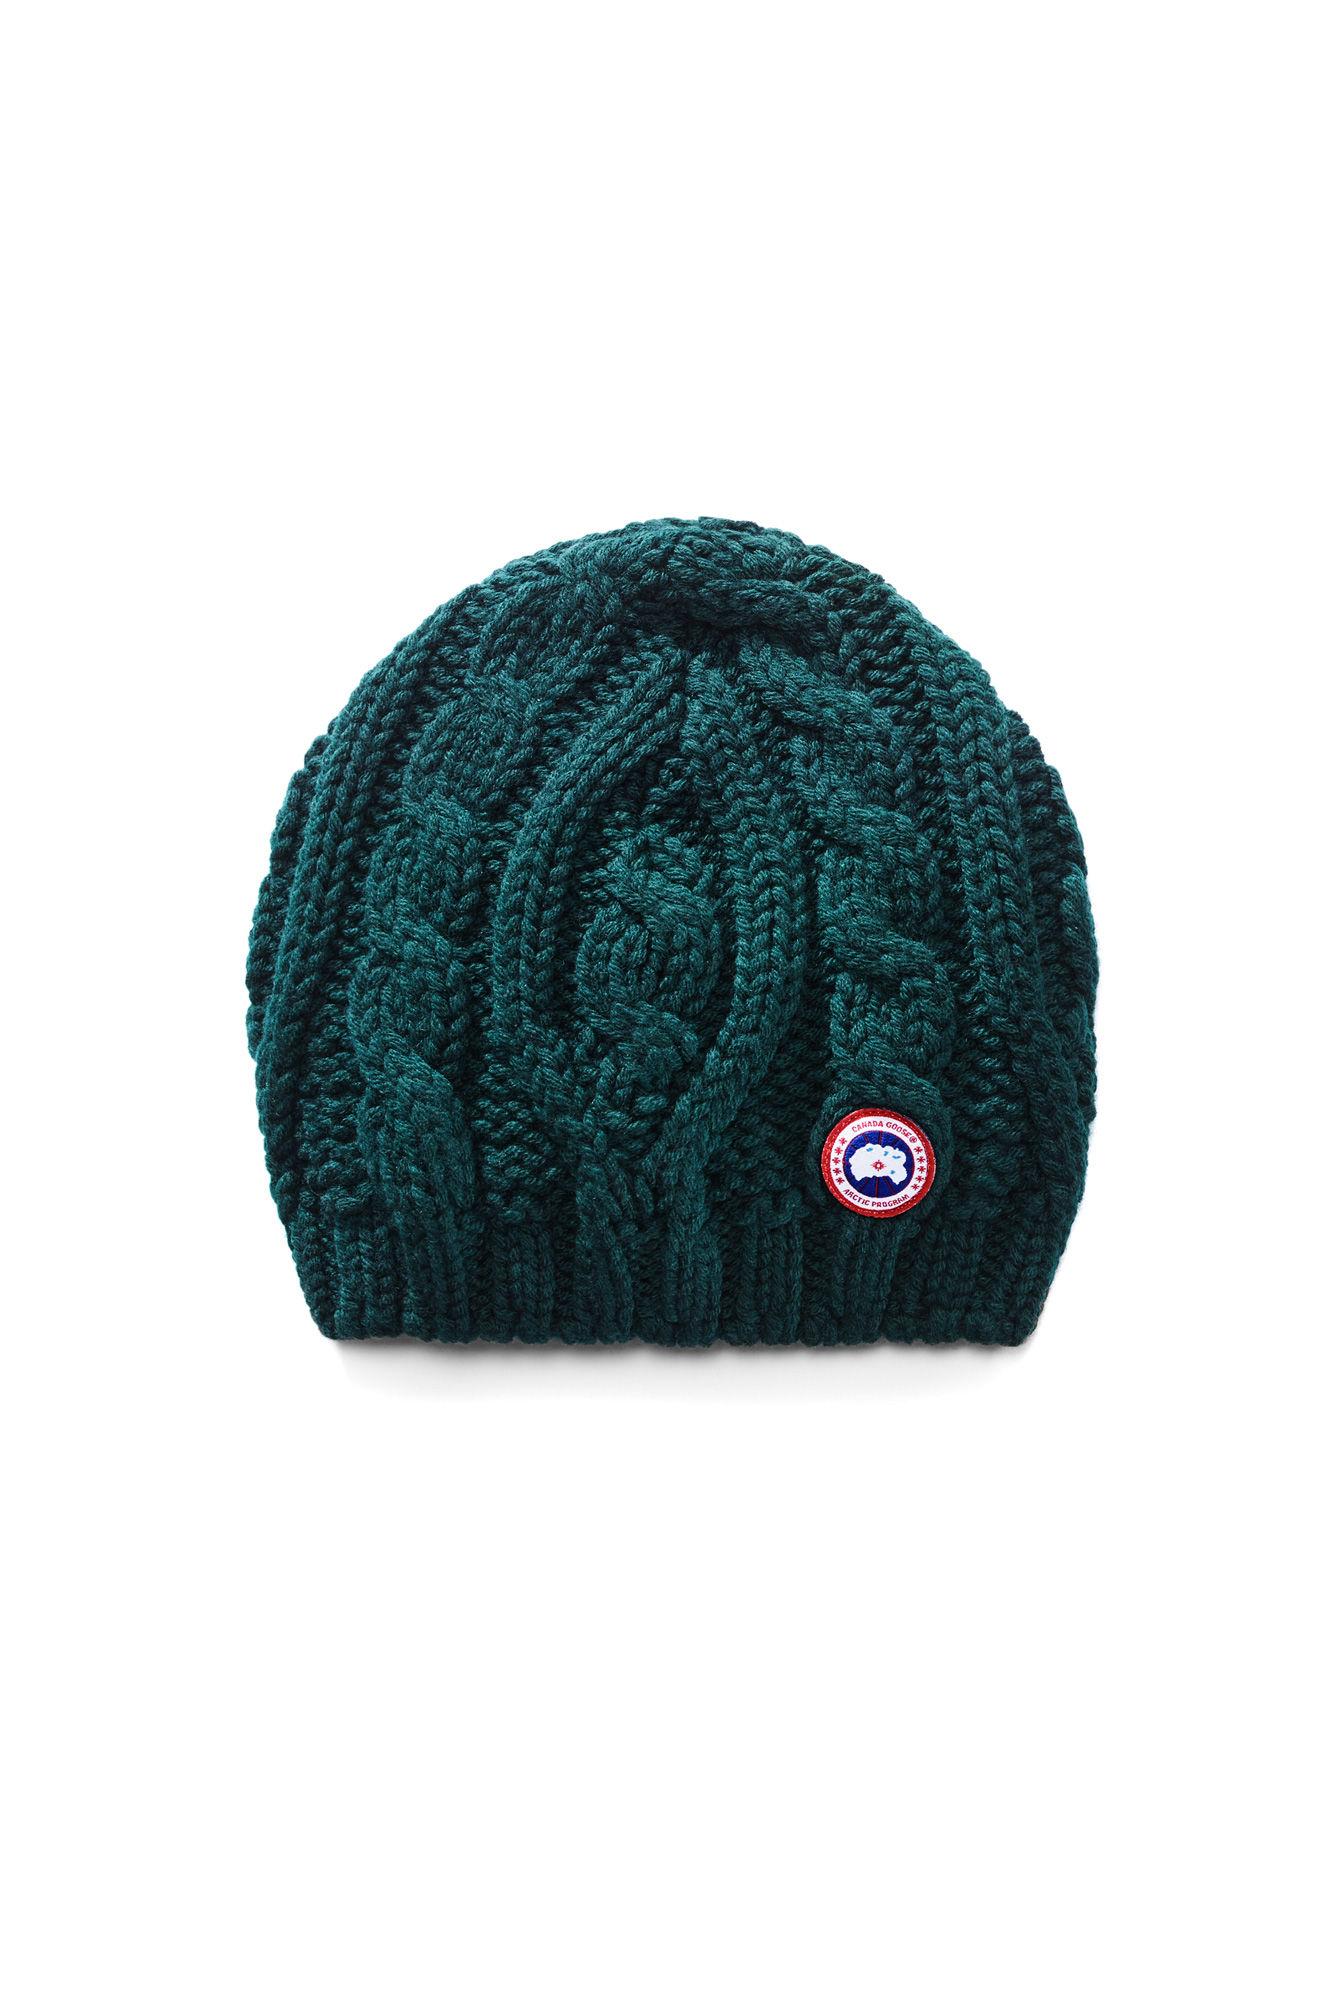 ecc33f71c67ec Women s Chunky Cable Knit Beanie